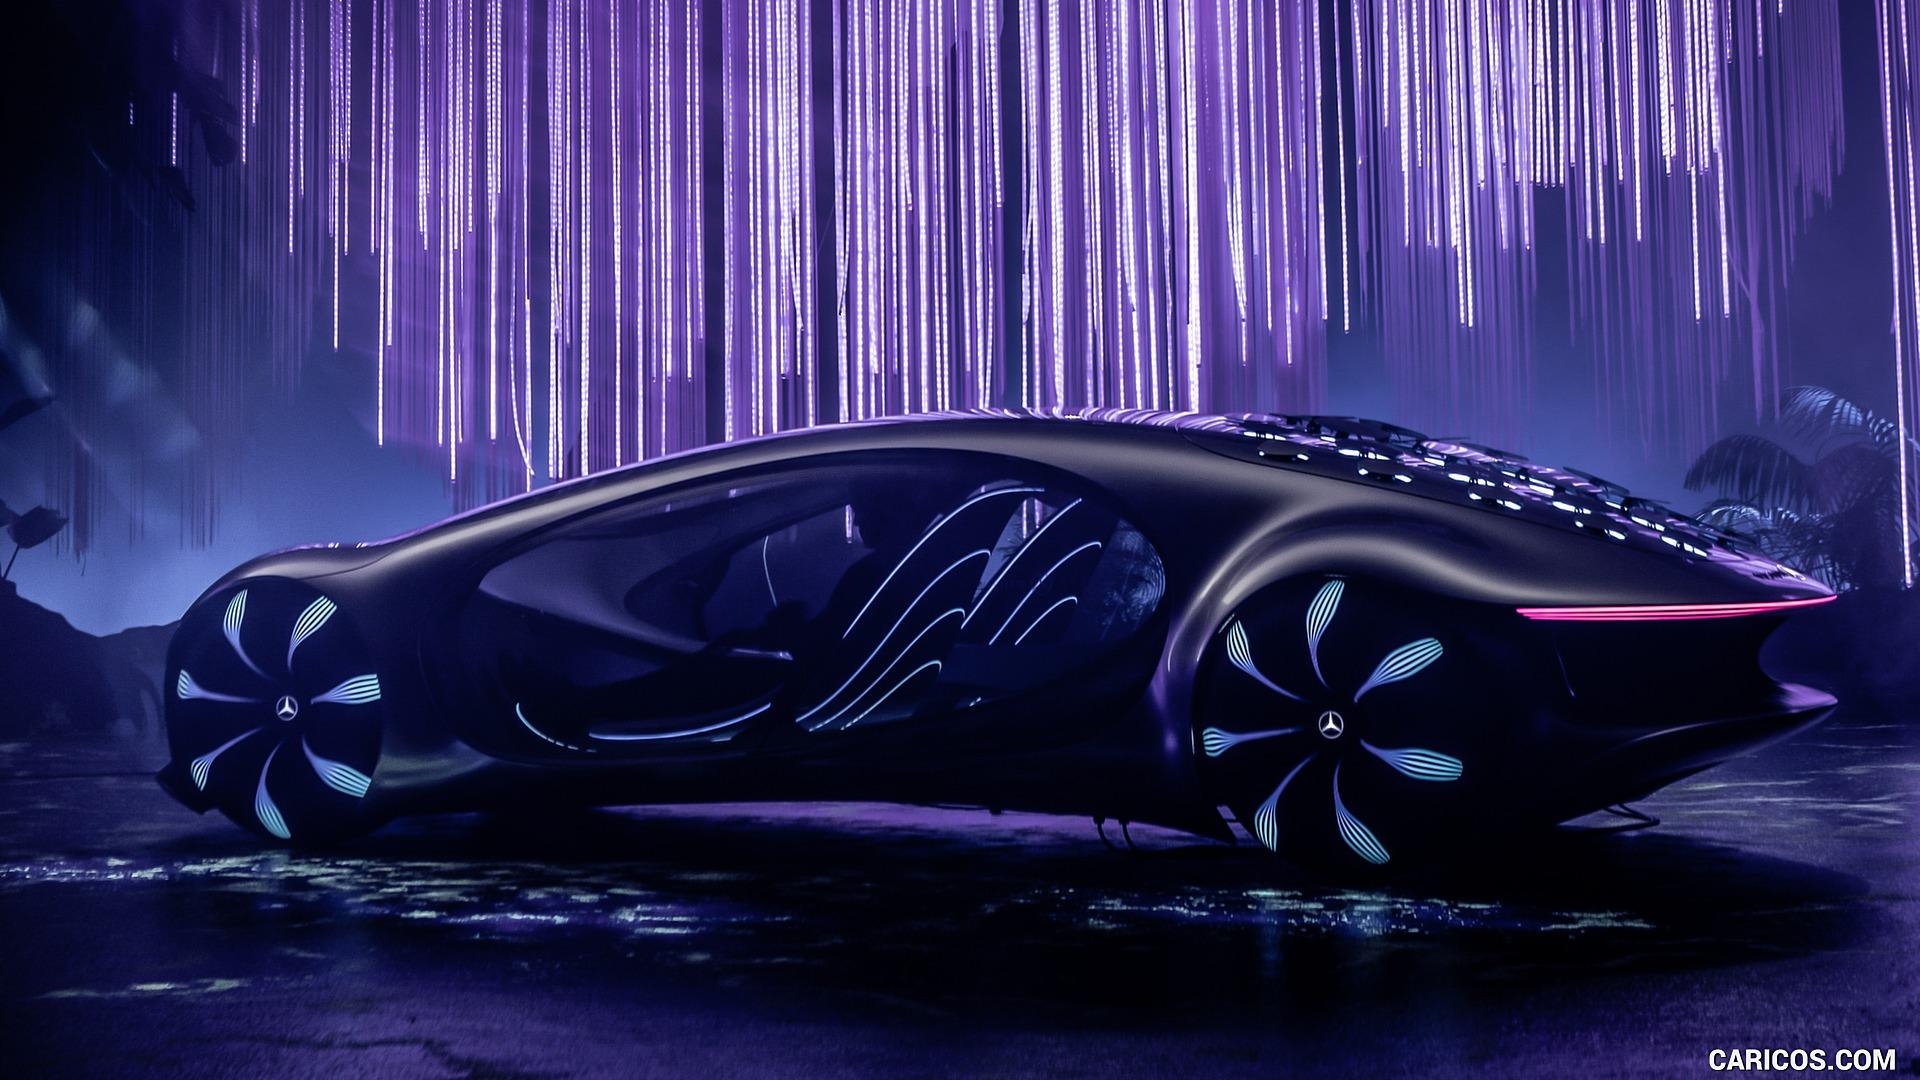 2020 Mercedes Benz VISION AVTR Concept   Side HD Wallpaper 12 1920x1080